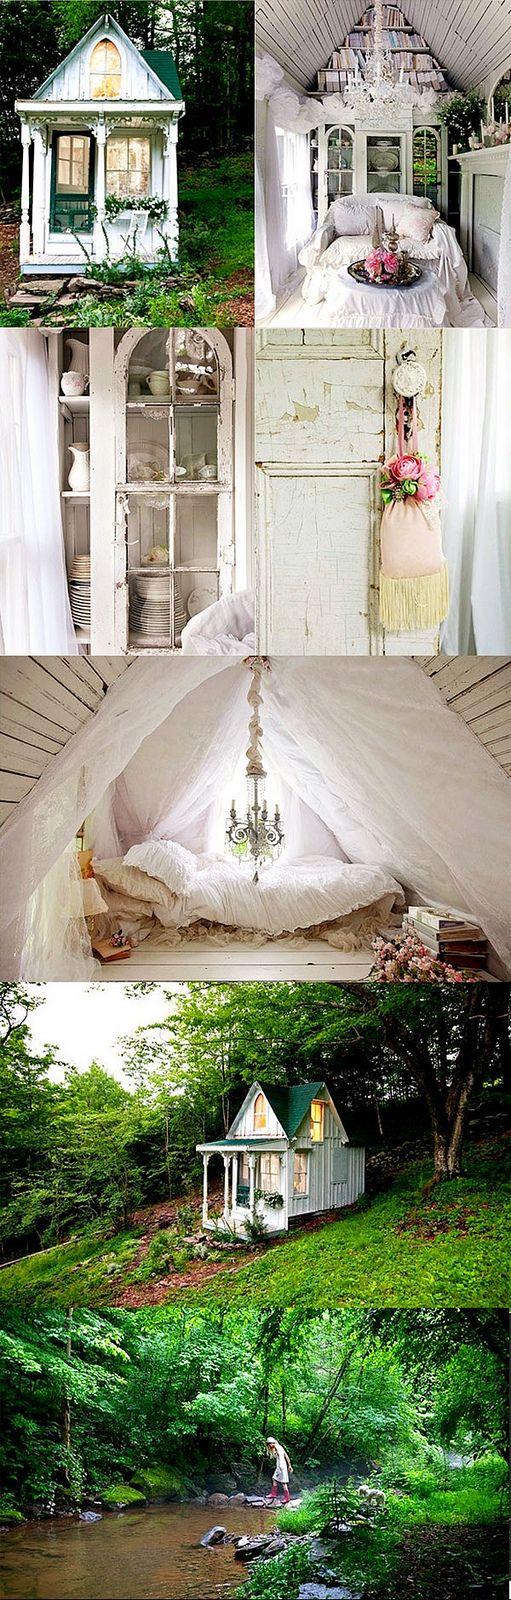 Tiny victorian cottage!